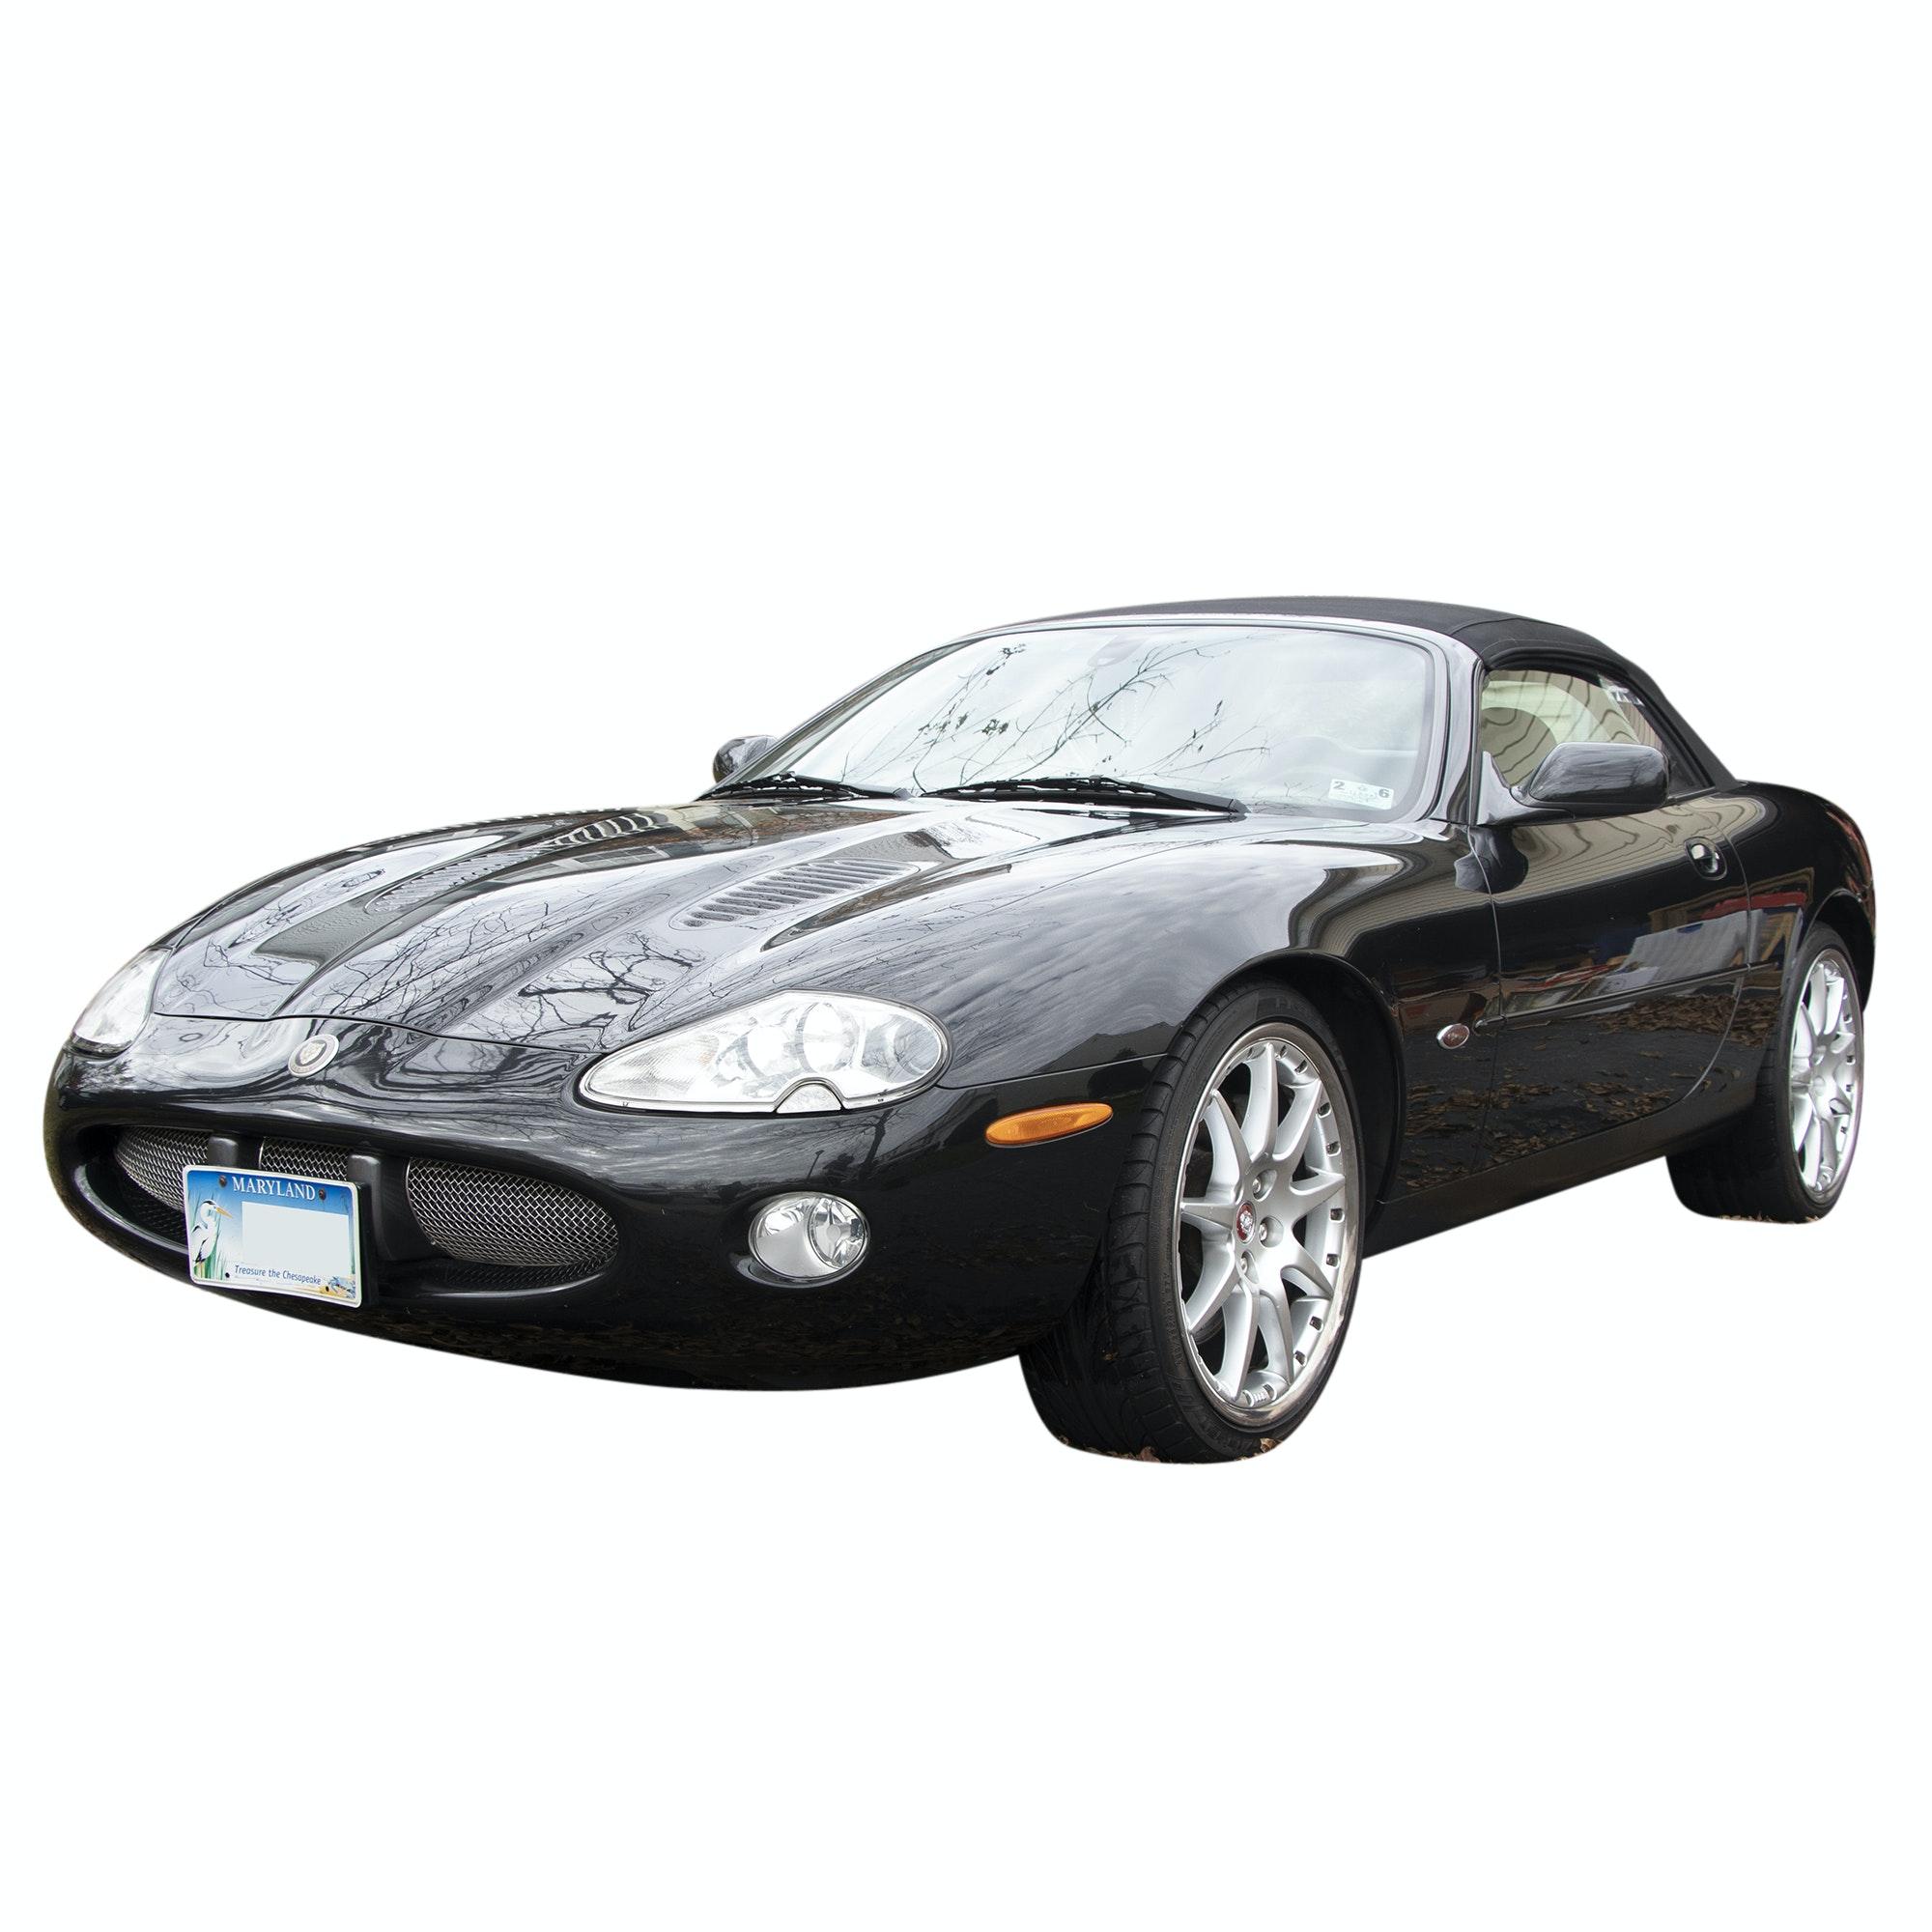 2002 Jaguar XKR 100 Convertible